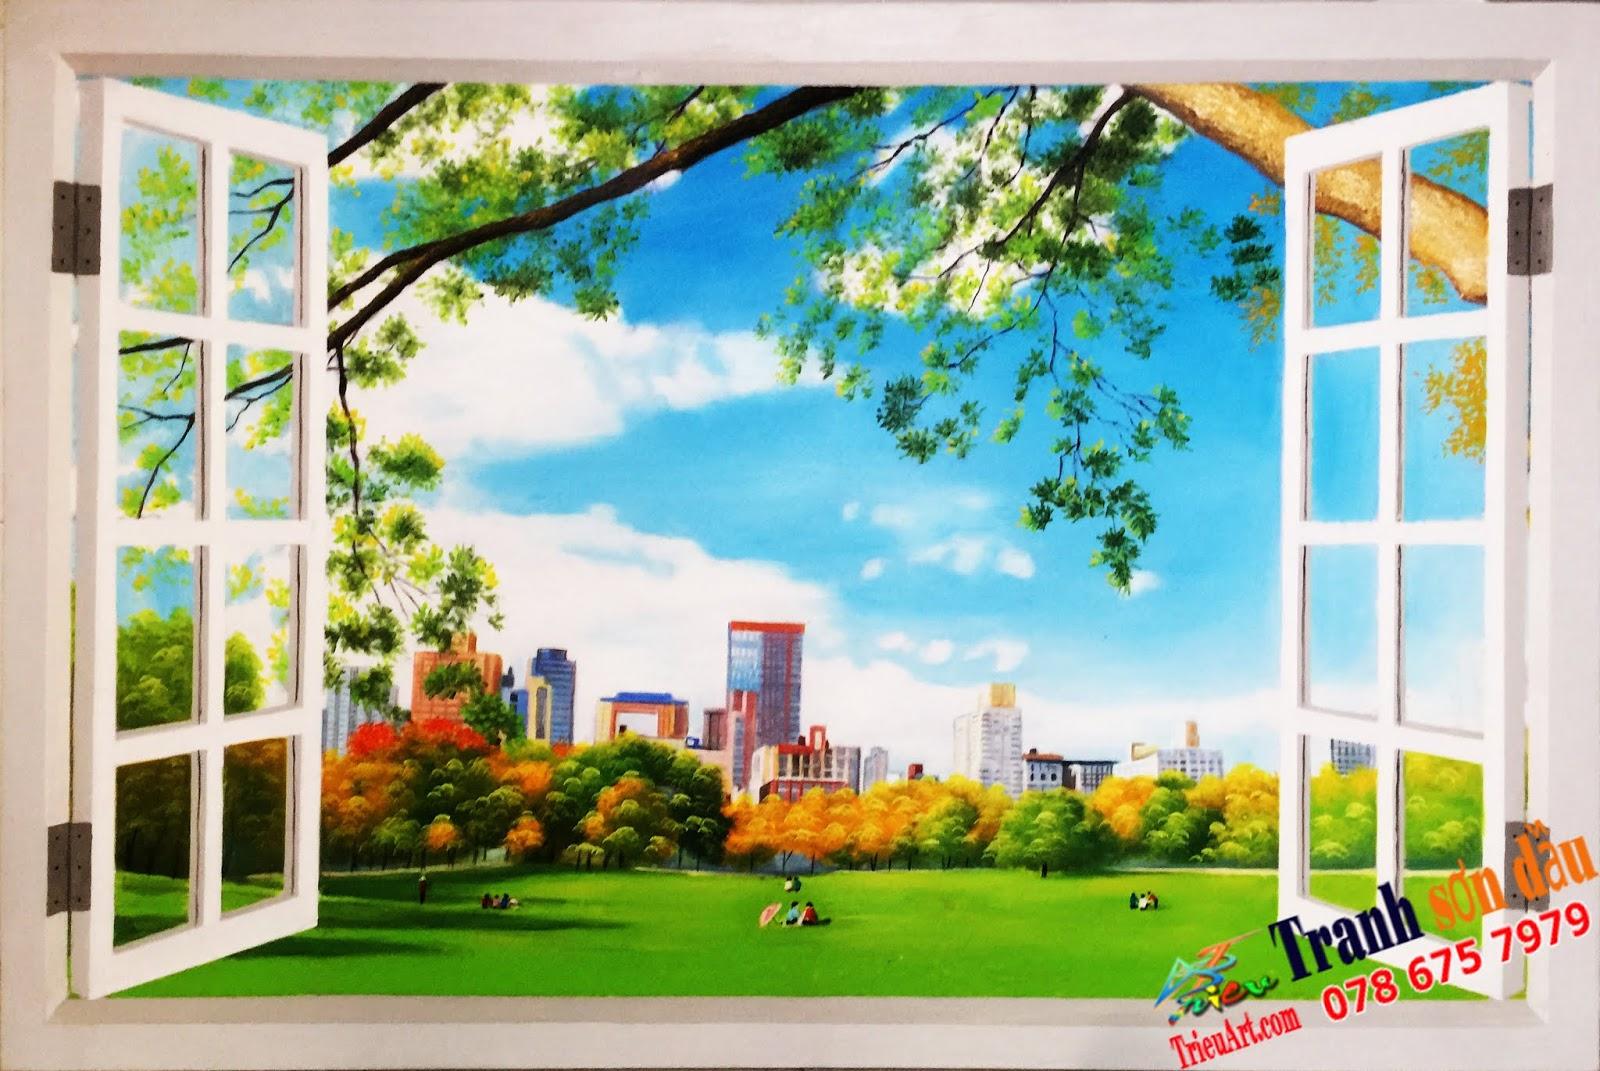 Tranh cửa sổ 3D